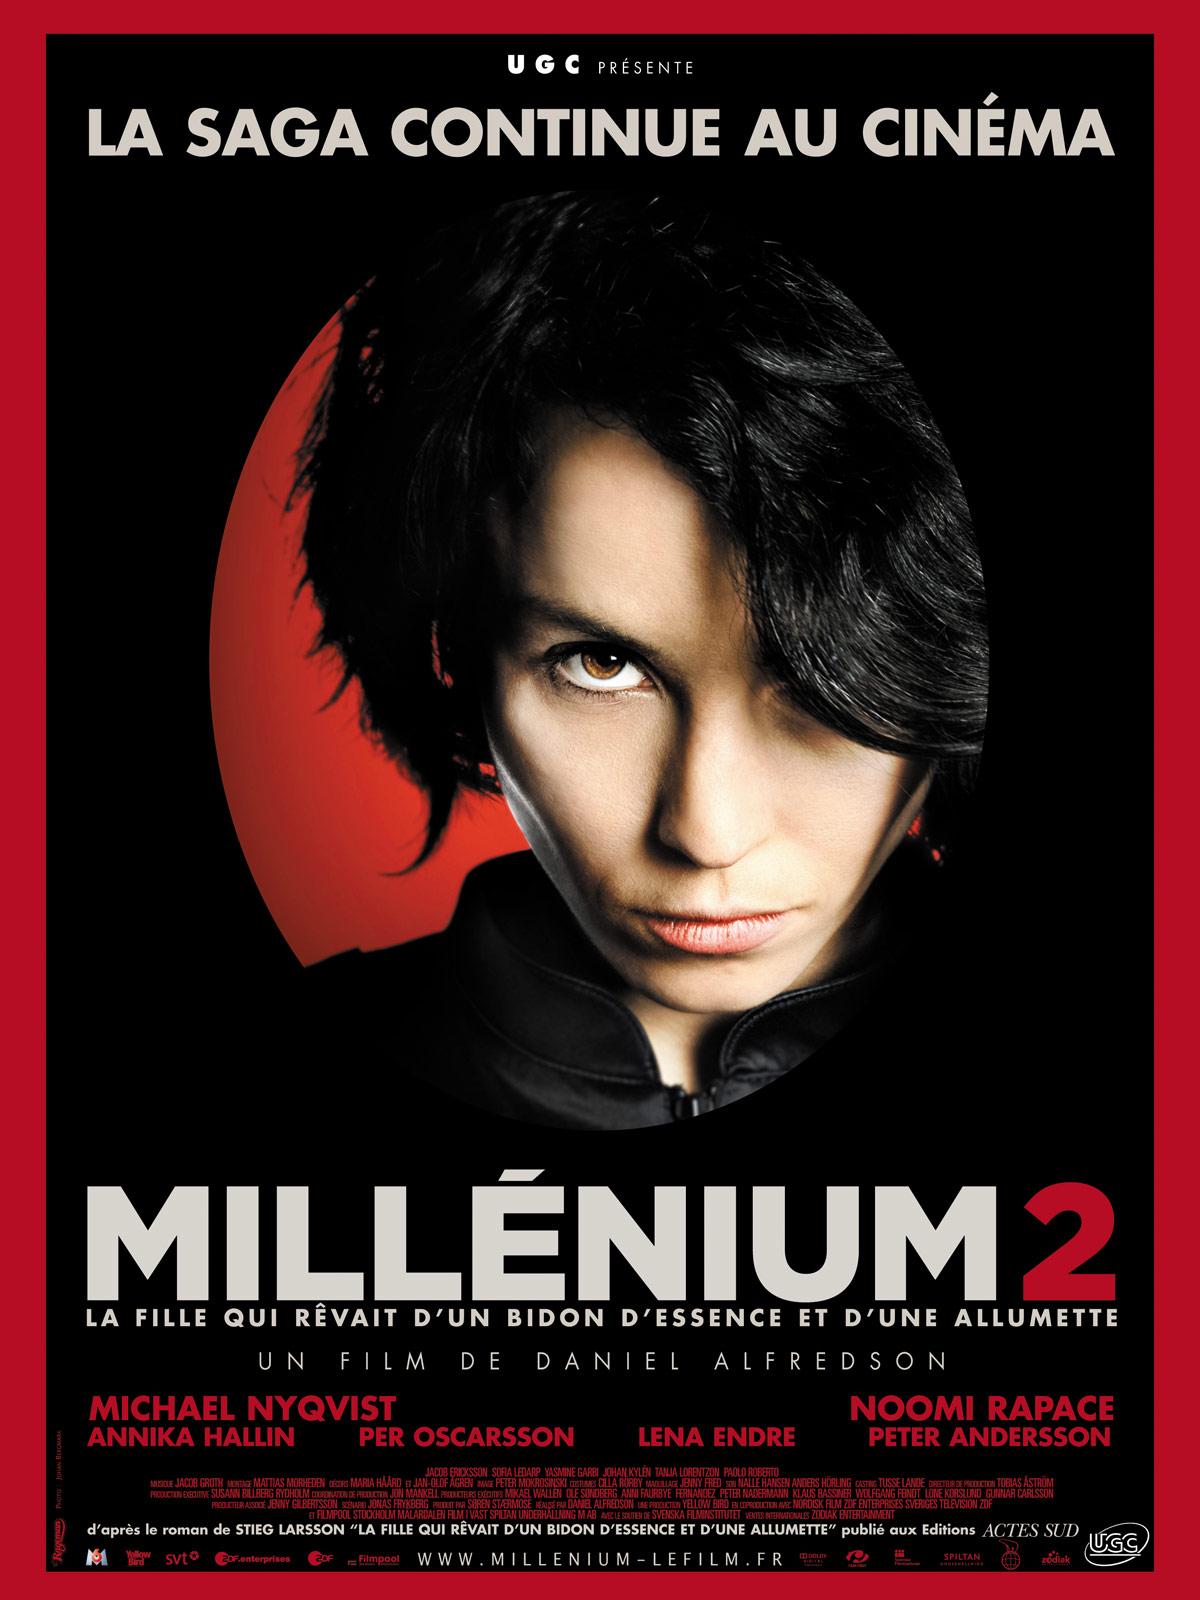 Millenium 4 Ce Qui Ne Me Tue Pas Streaming Vf : millenium, streaming, Millénium, Fille, Rêvait, Bidon, D'essence, D'une, Allumette, AlloCiné